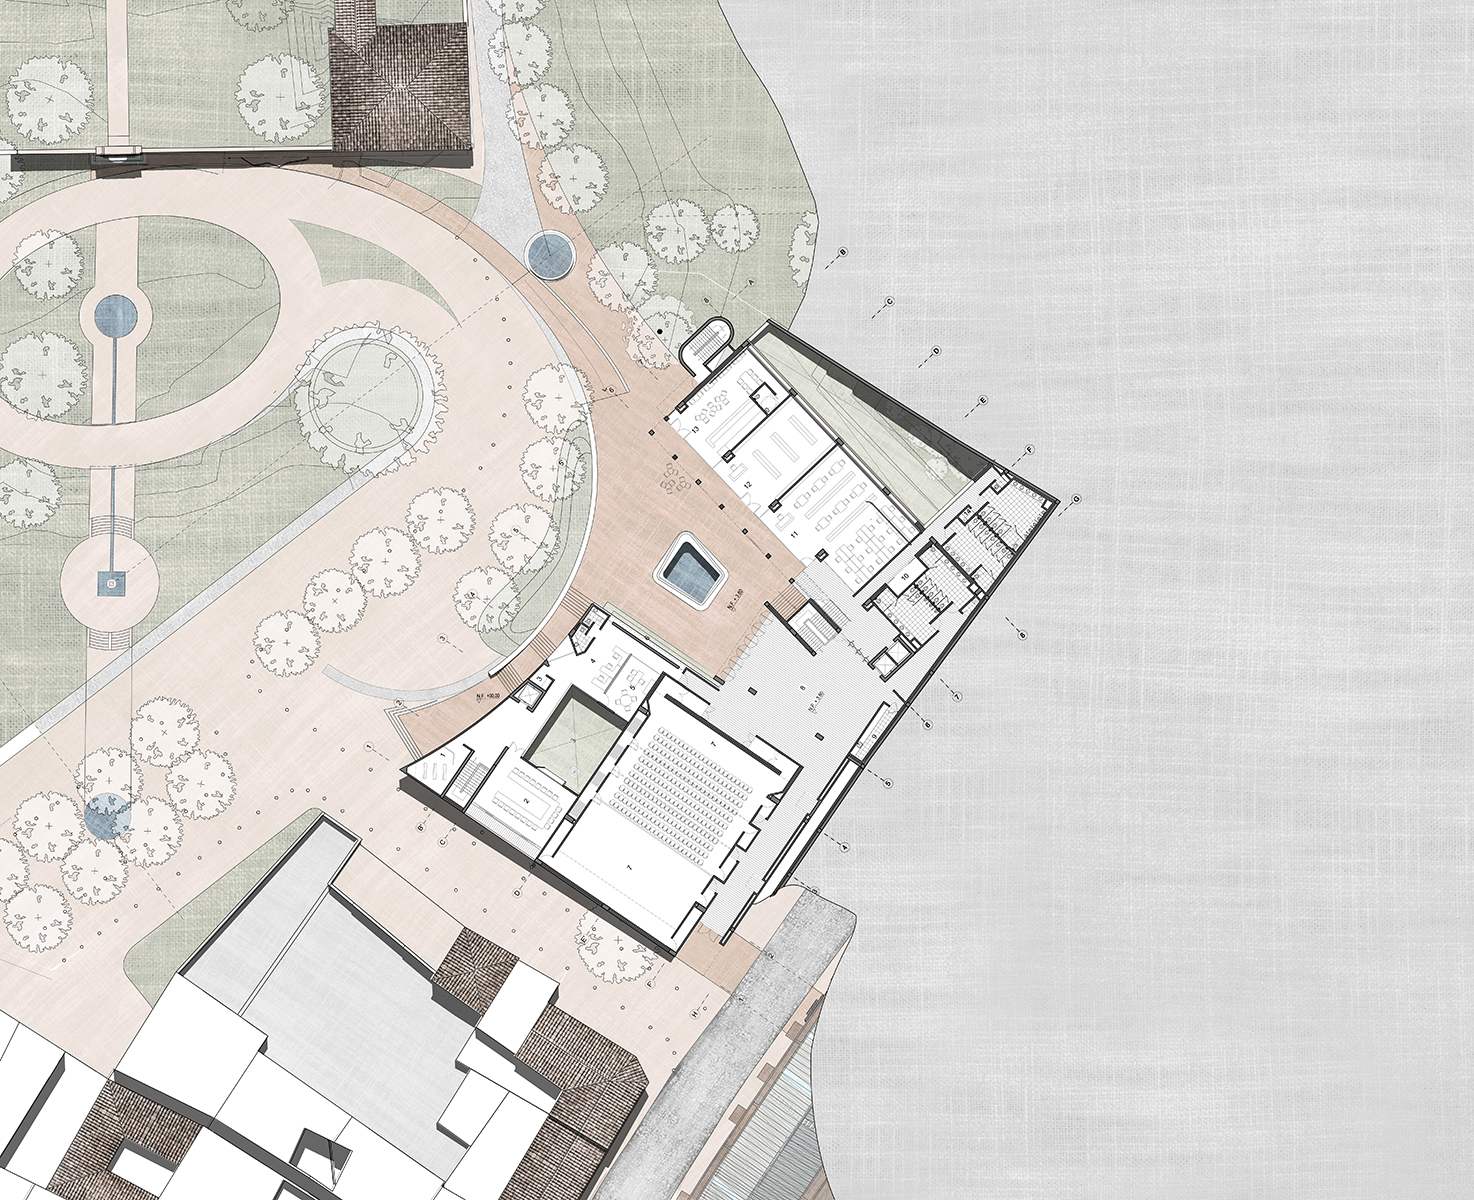 rir-arquitectos-uniandes-bolivariana-11.jpg